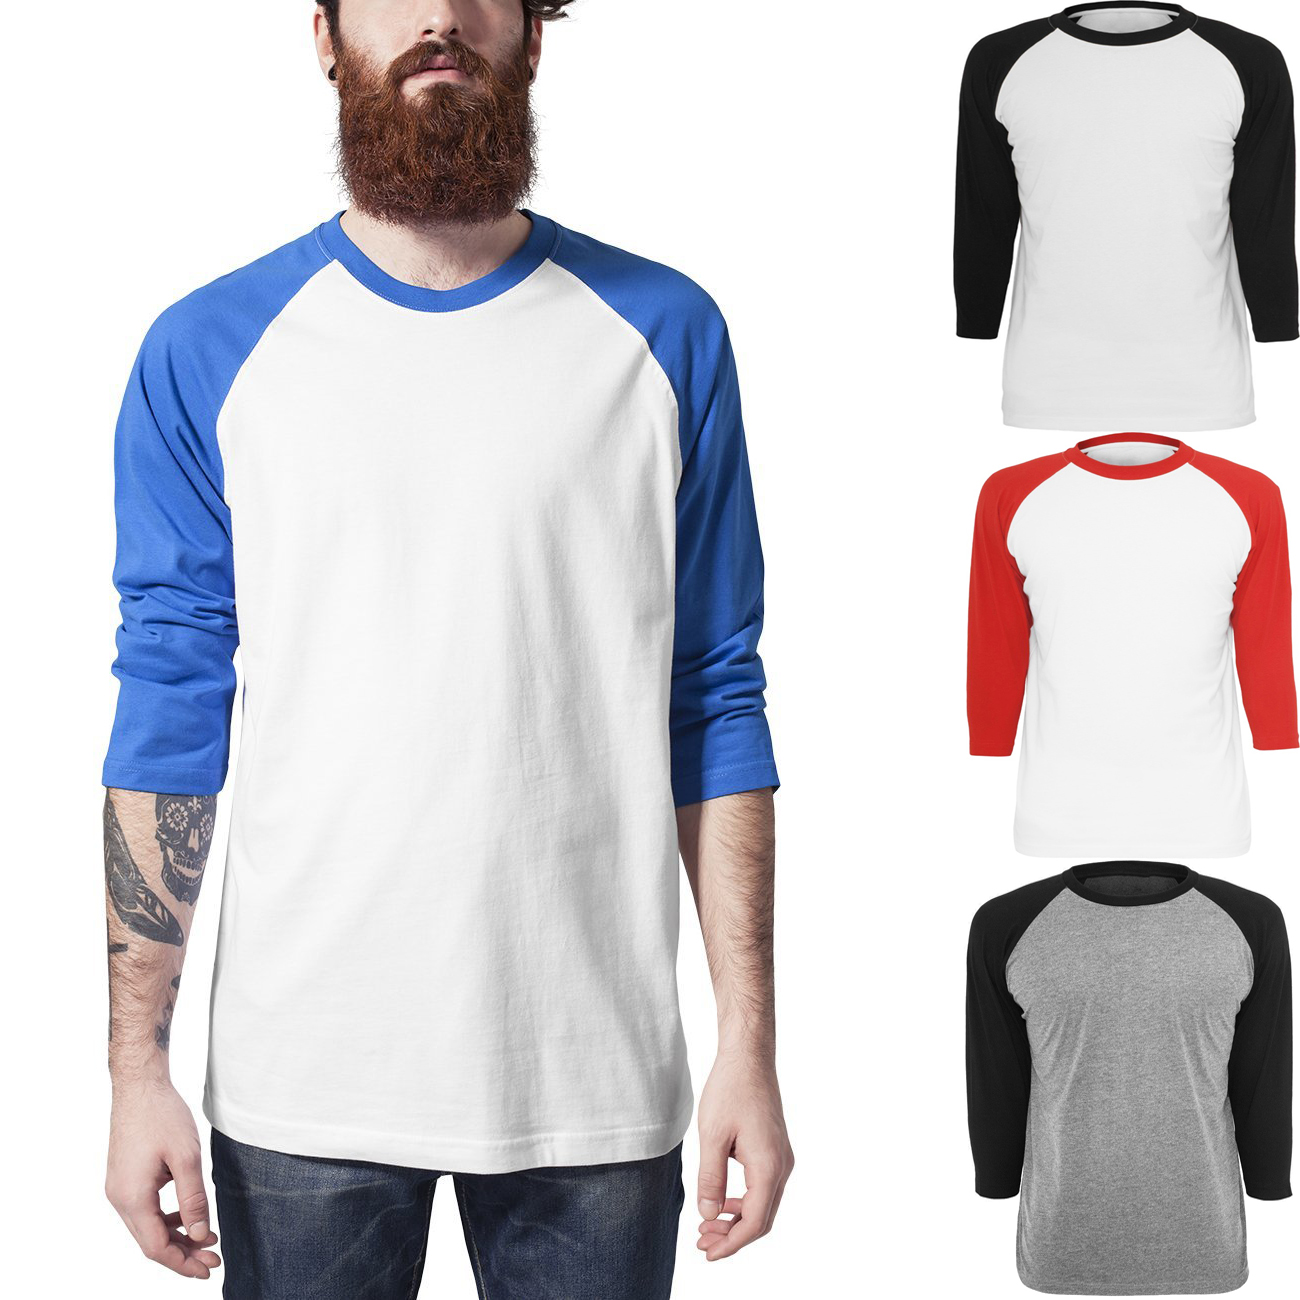 N Short Sleeve Full Button Baseball Top$ N 2-Button Color Blocked Baseball Henley$ N Camo 2-Button Henley$